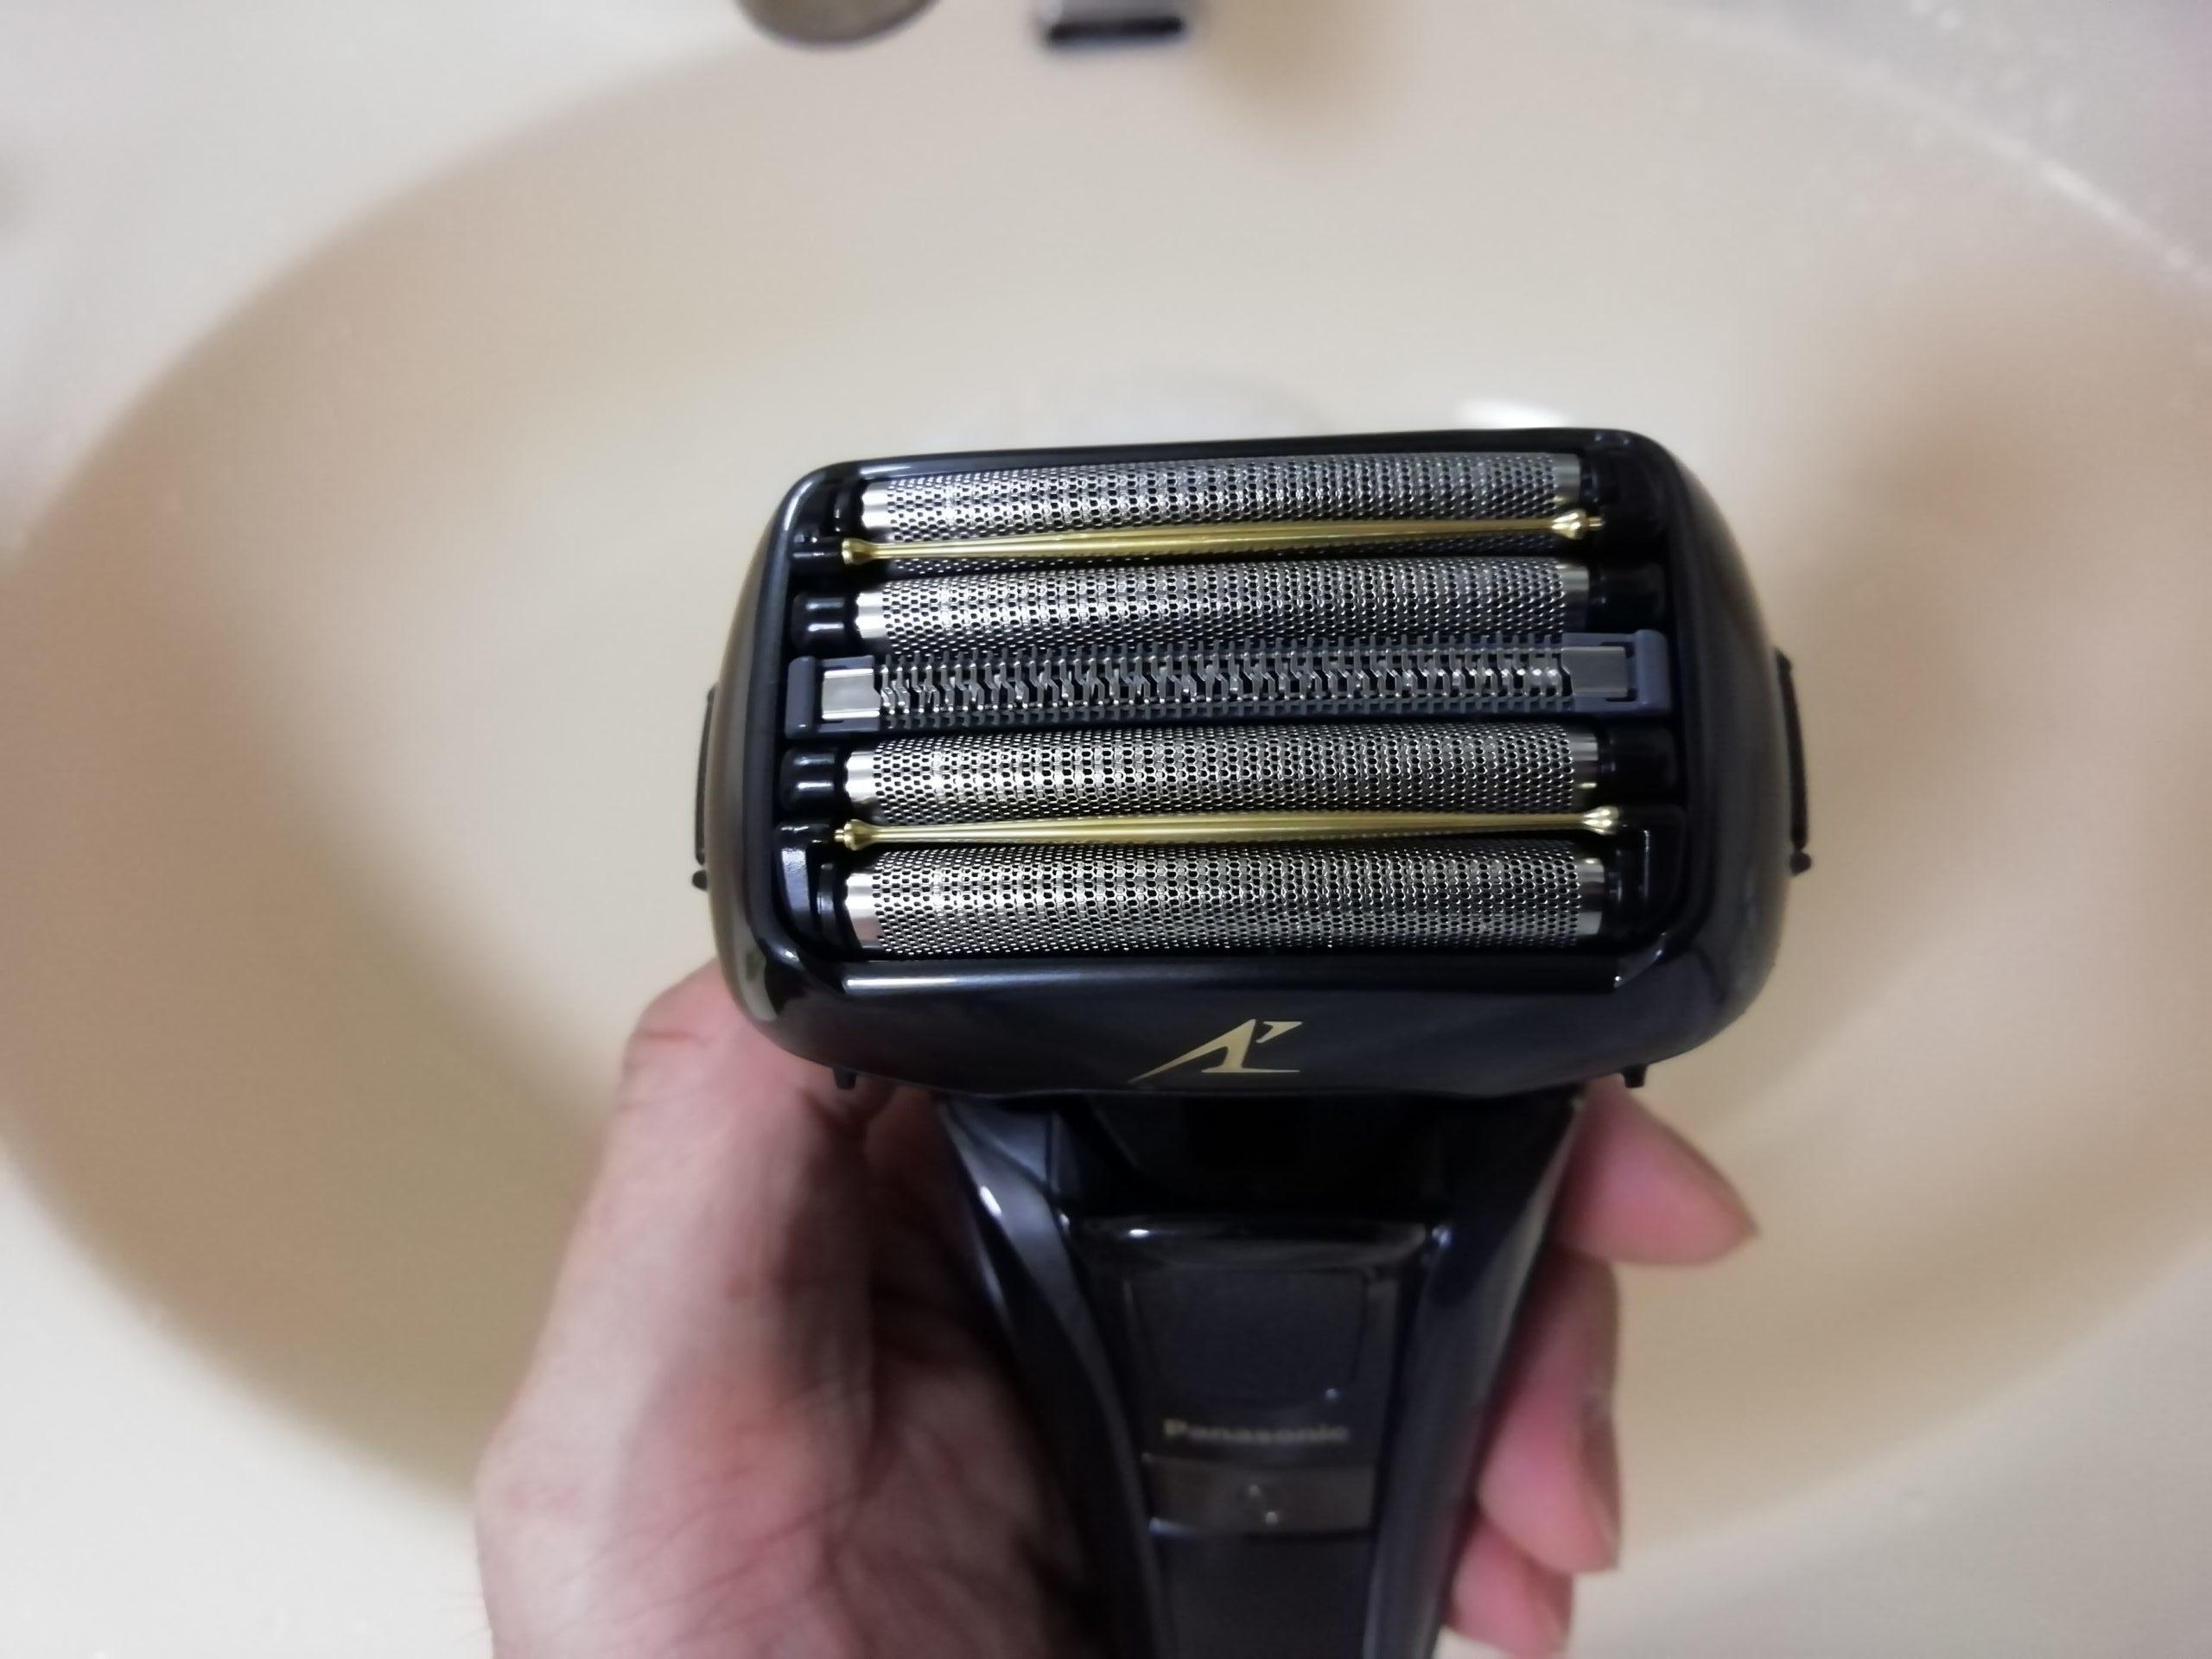 Panasonicの電気髭剃り「ES-ELV7E」は5枚刃